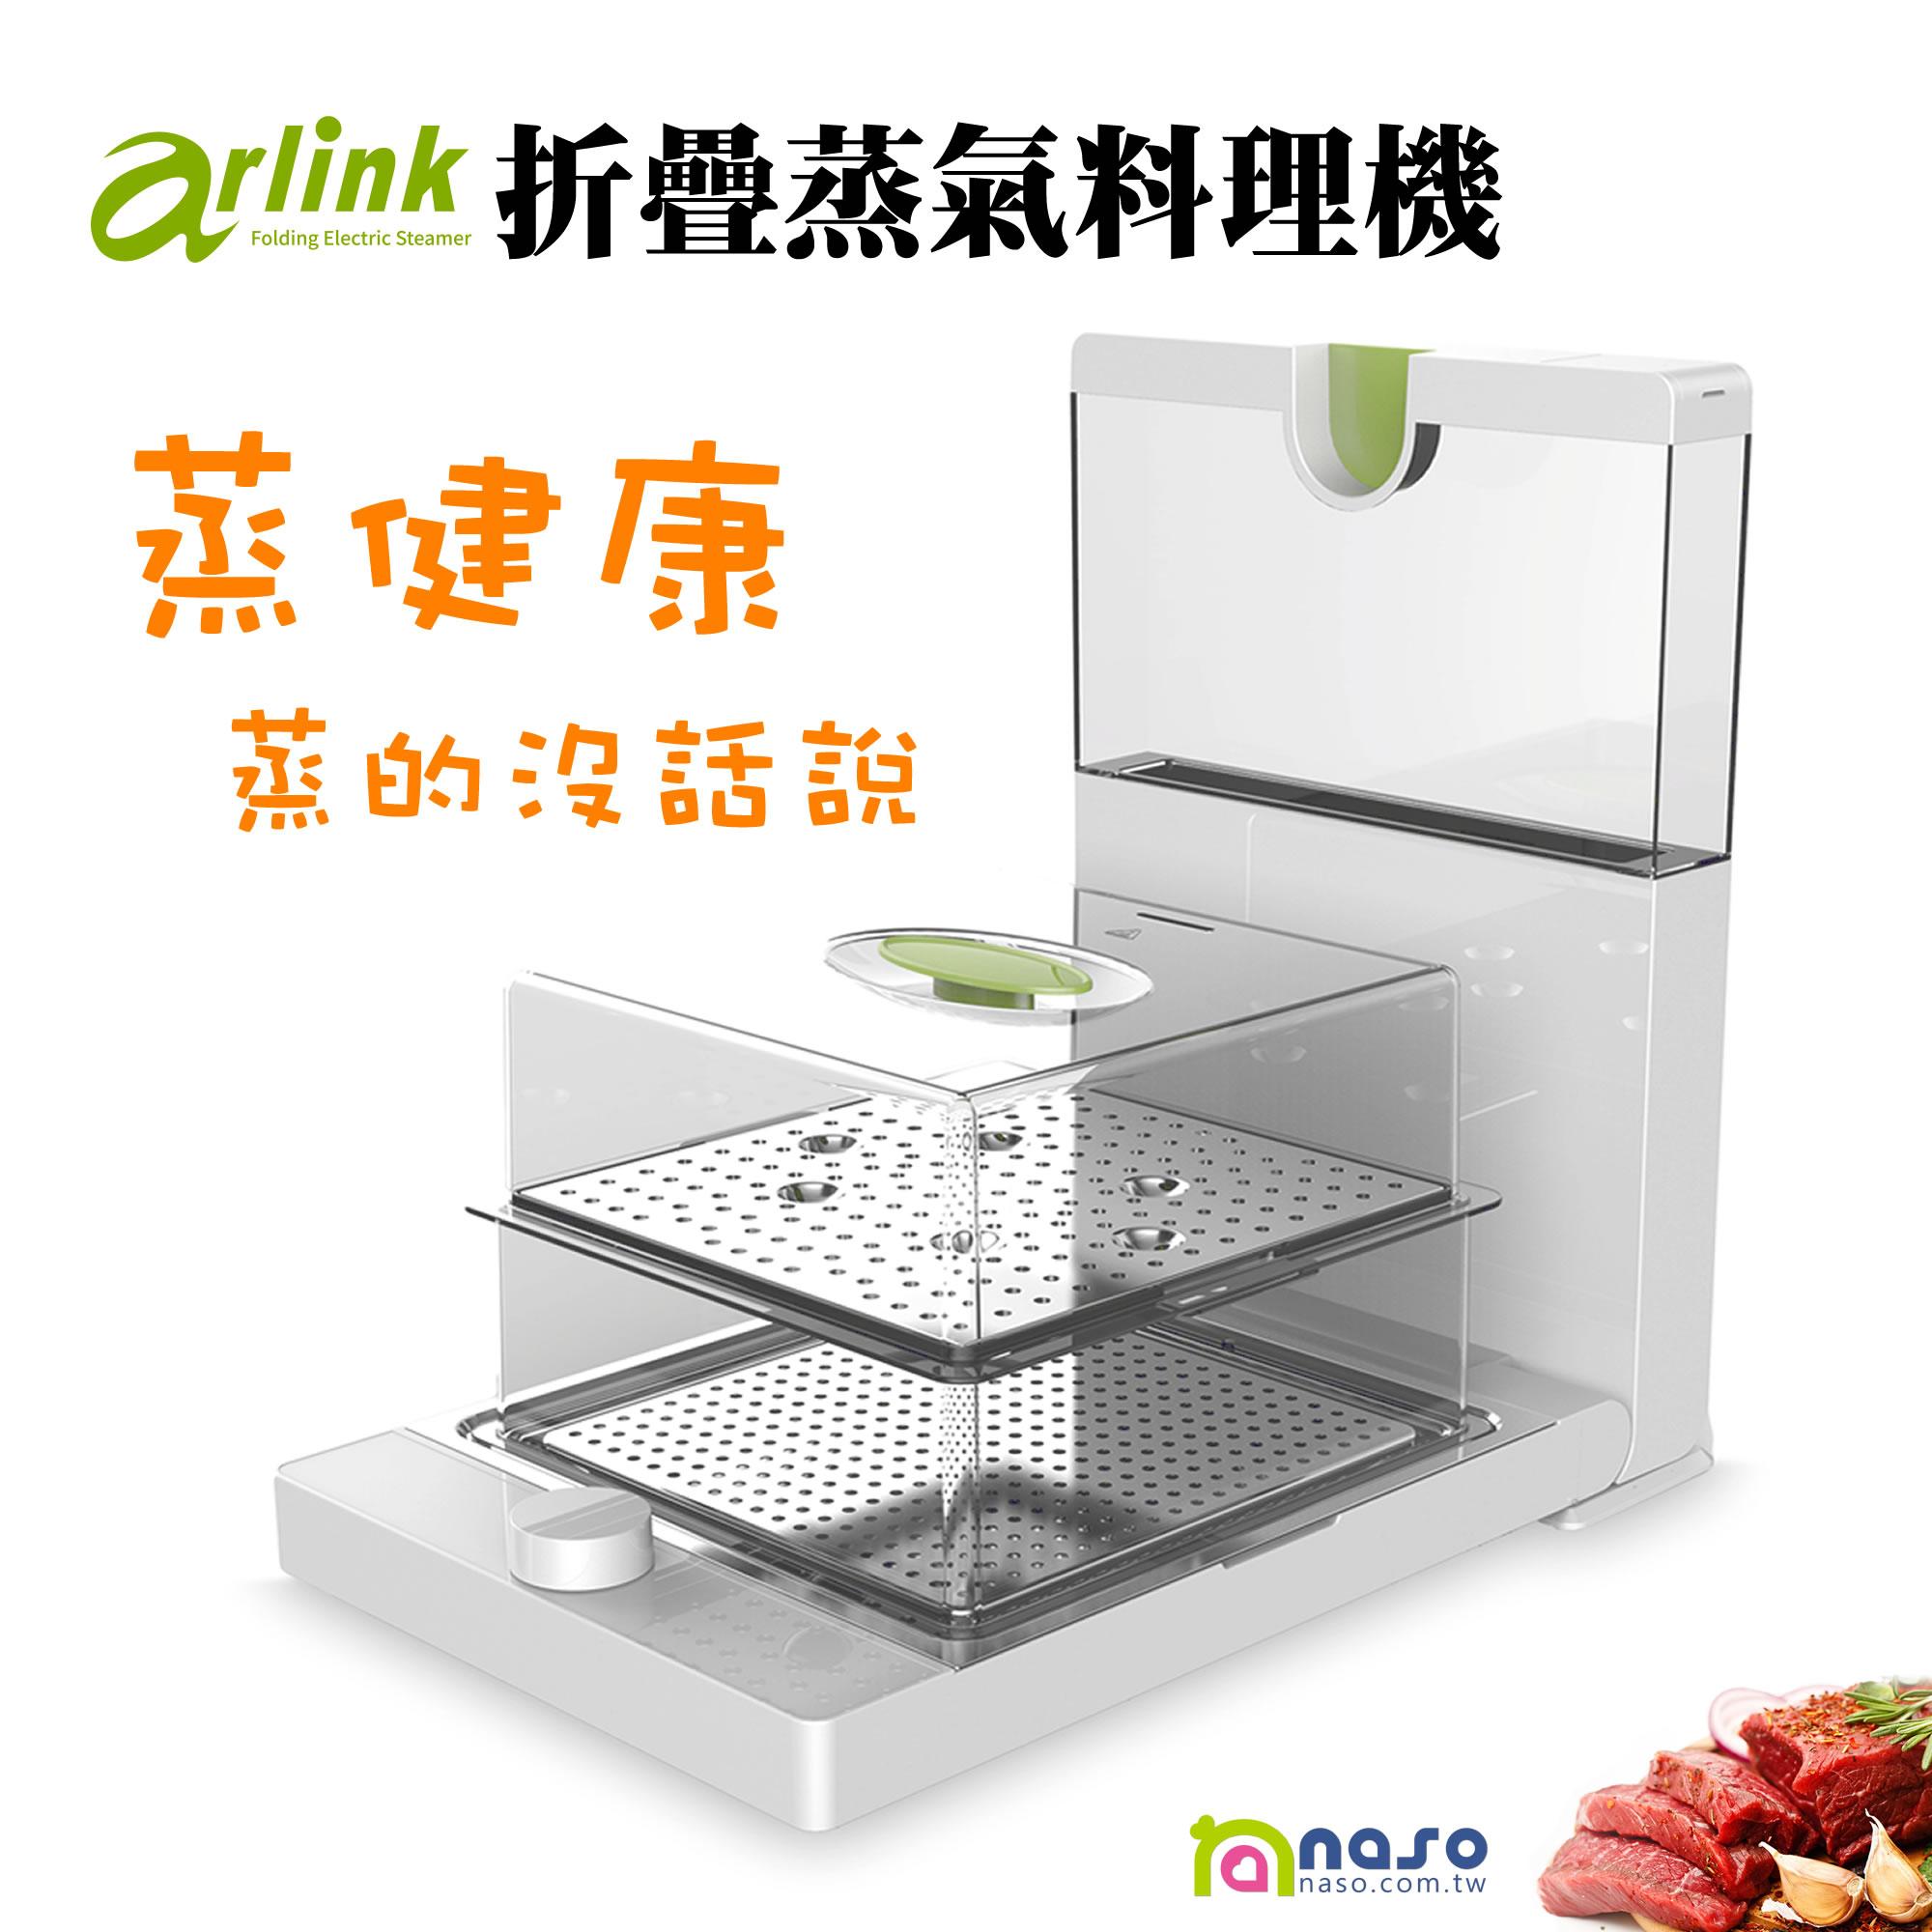 【Arlink】蒸的健康折疊蒸氣料理機(AWV-7700)